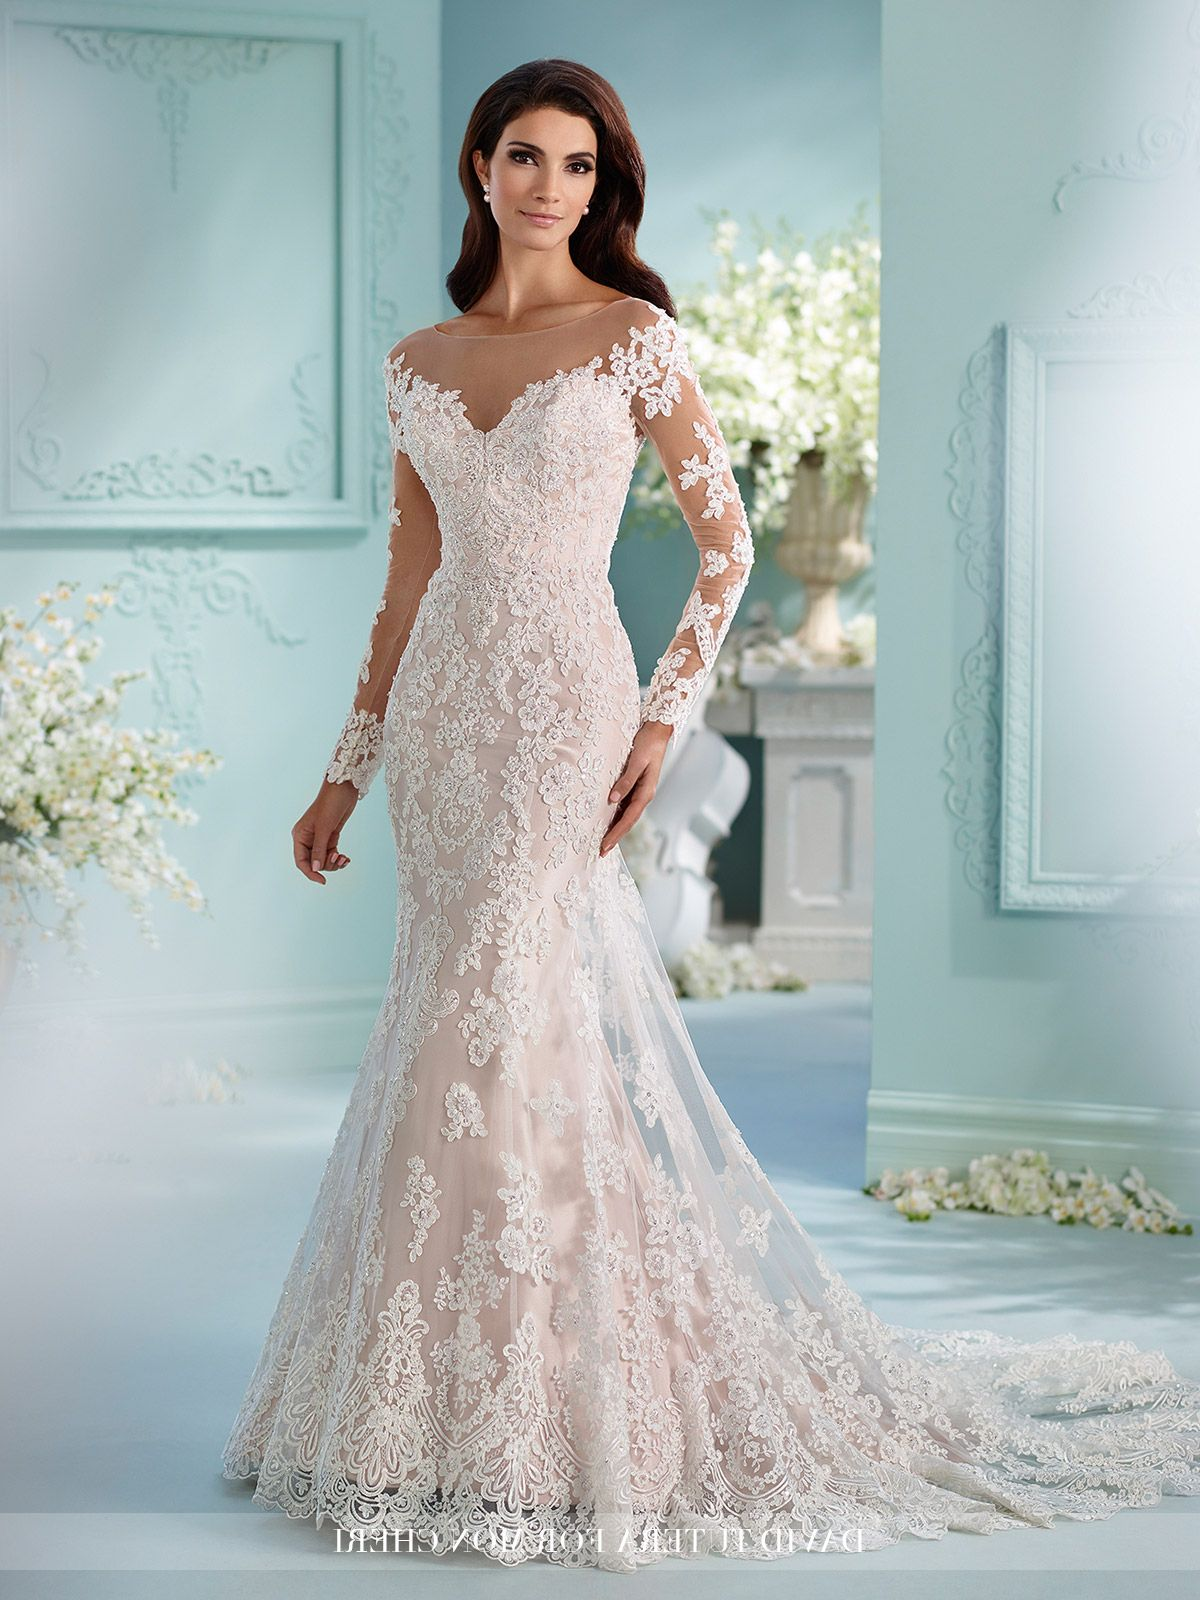 Awesome Wedding Dress Dallas | Wedding Photography